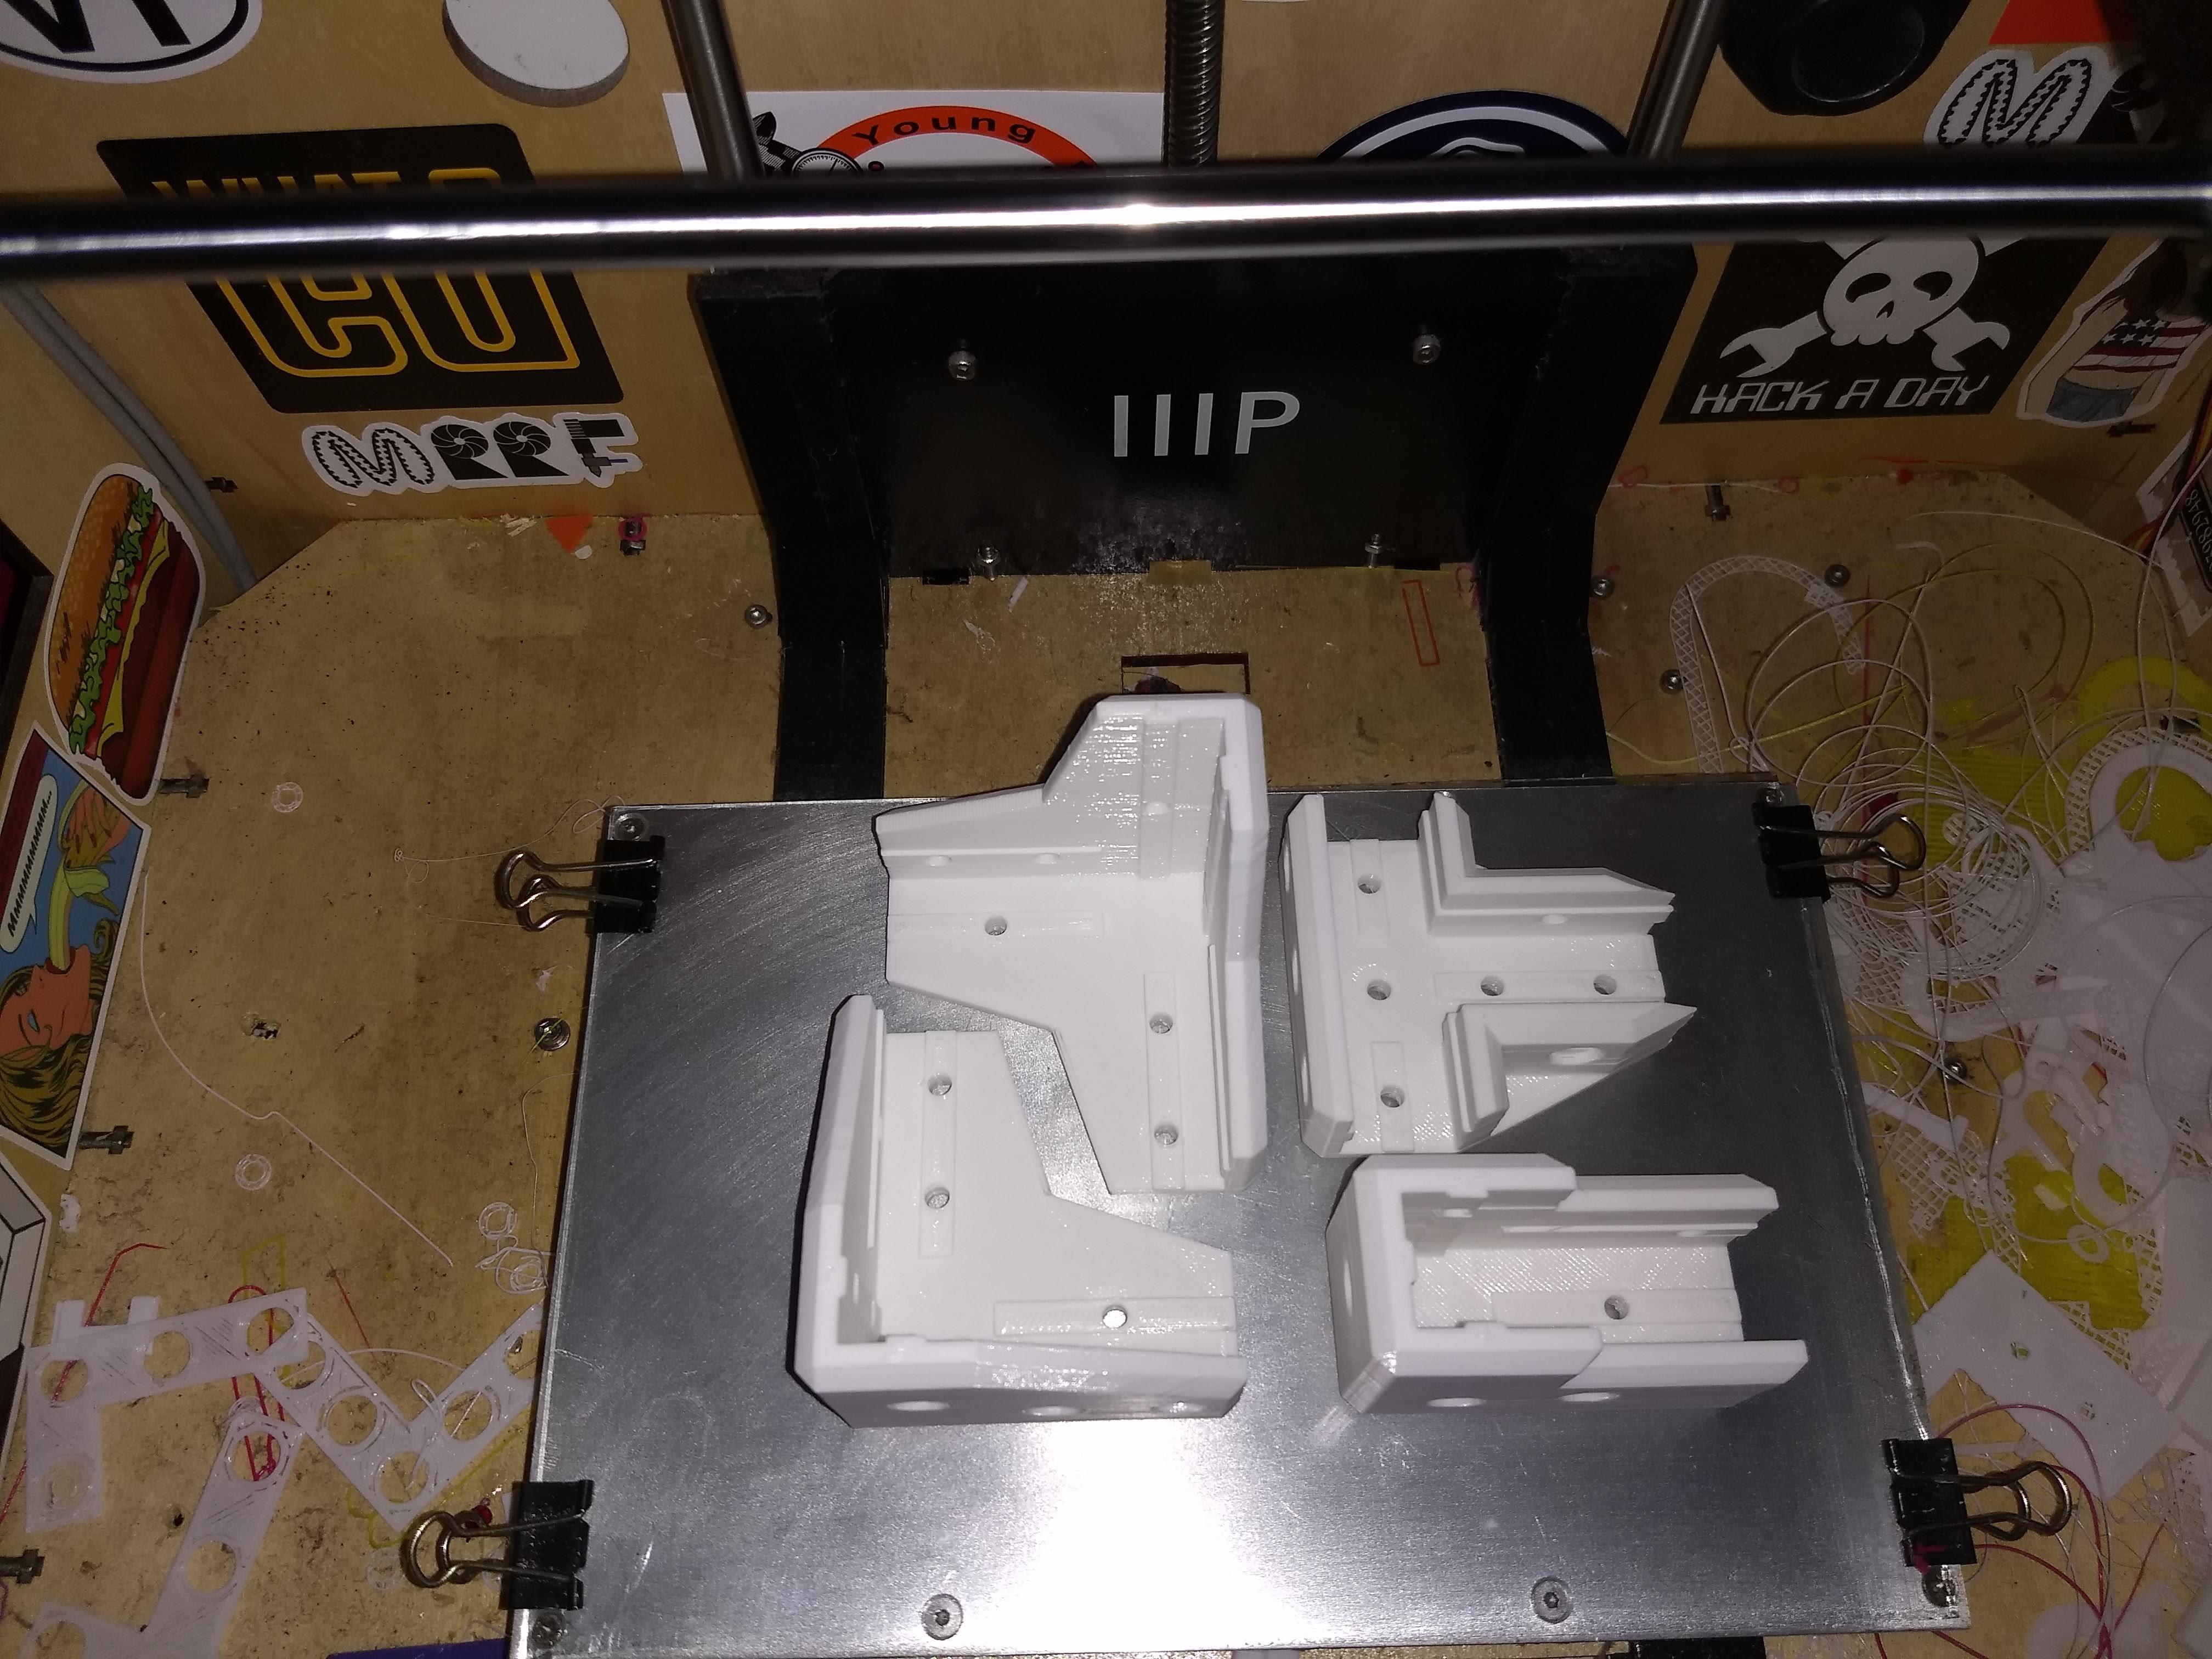 IMG_20200122_163116813.jpg Download free STL file 2020 Profile Aluminum 3D Printable Erector Set • 3D printer model, adamjvr